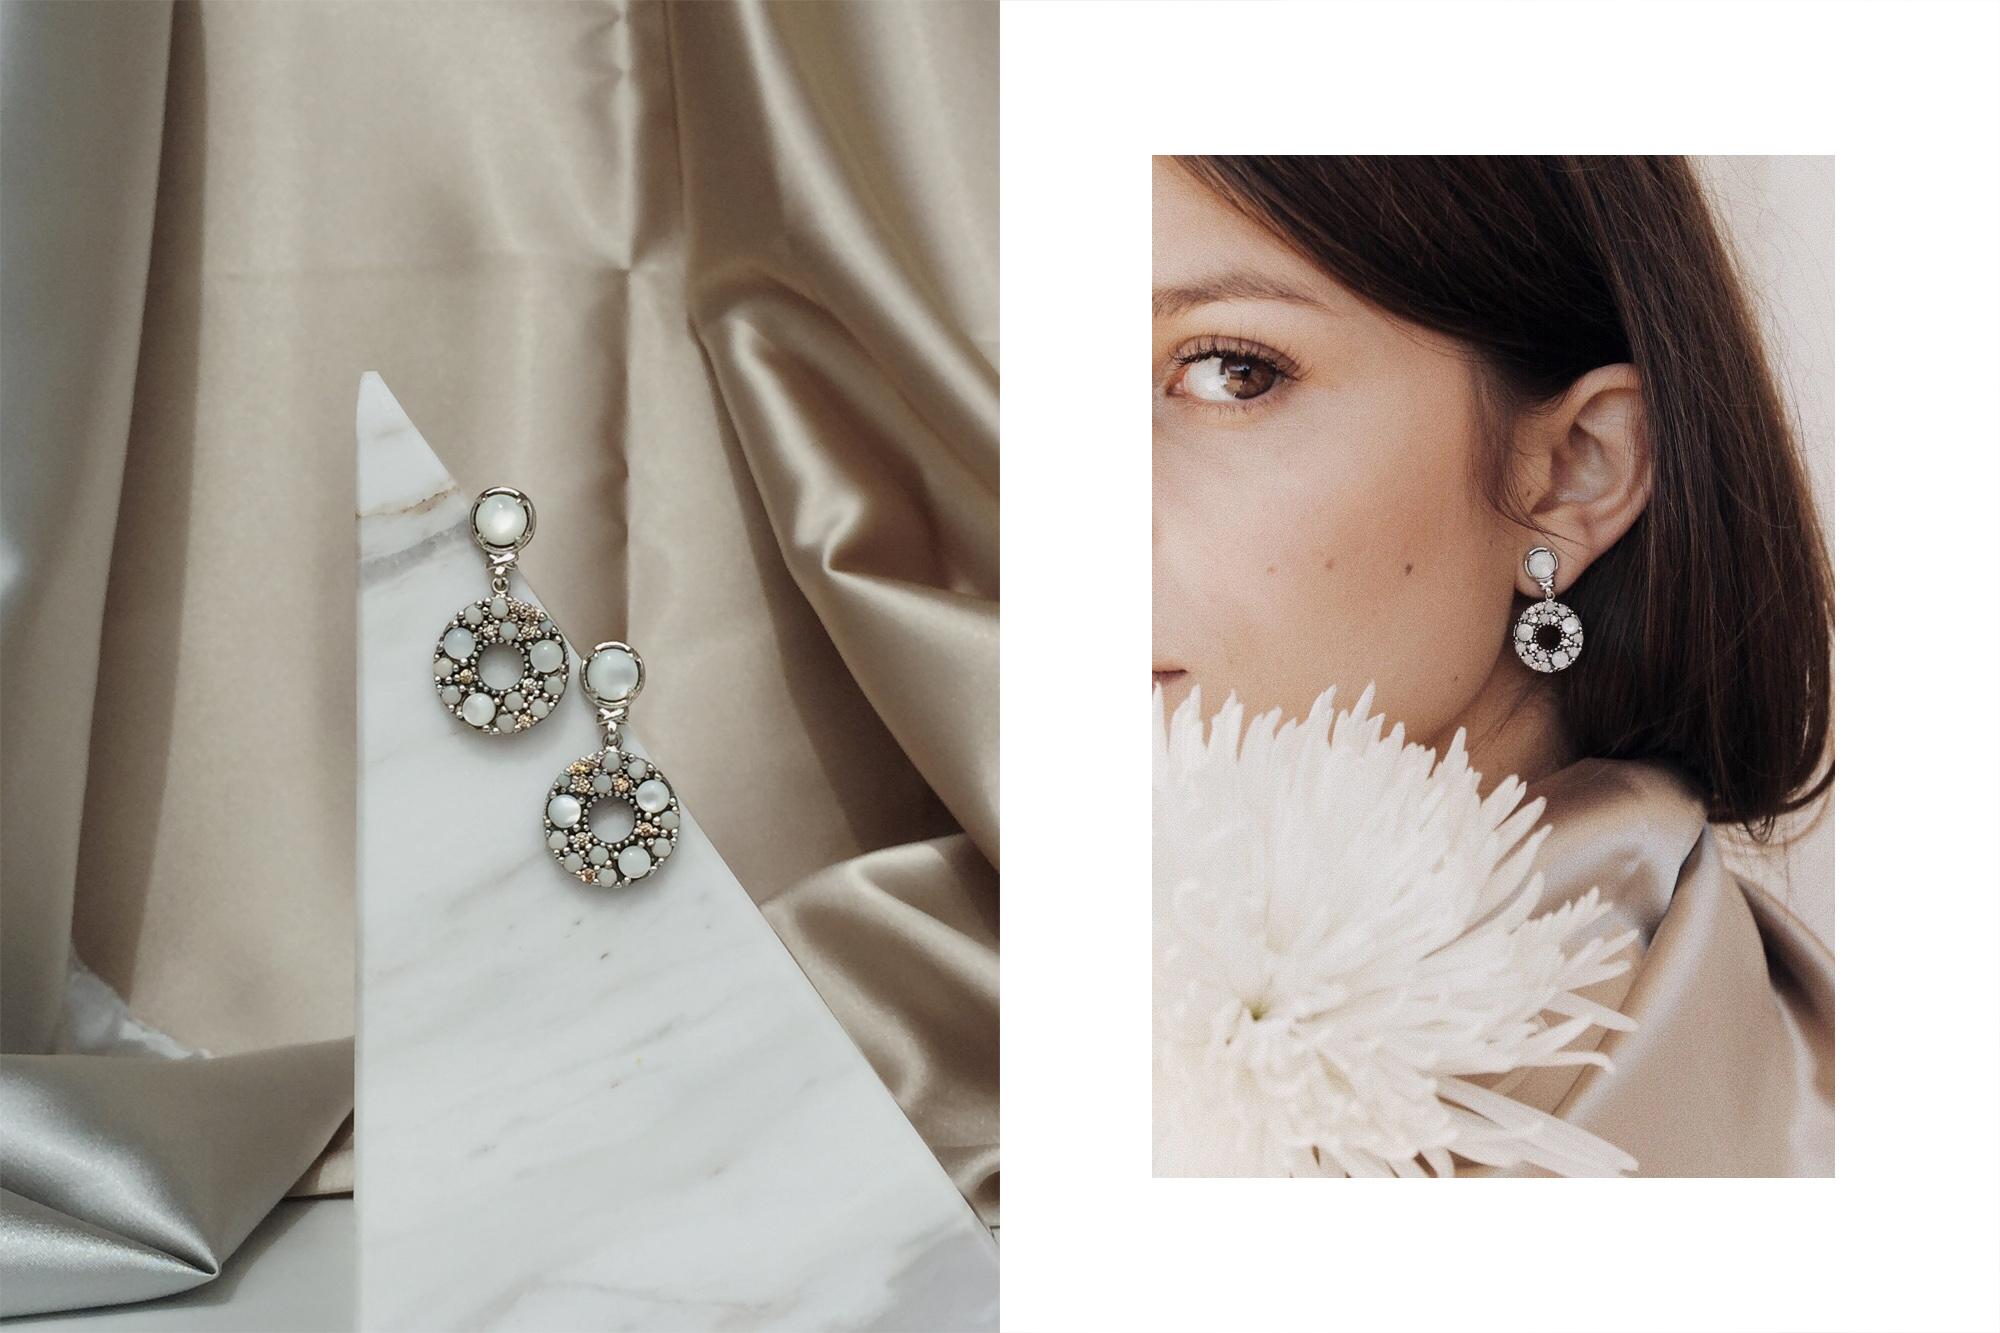 xdc_parhelia_earrings_2.jpg